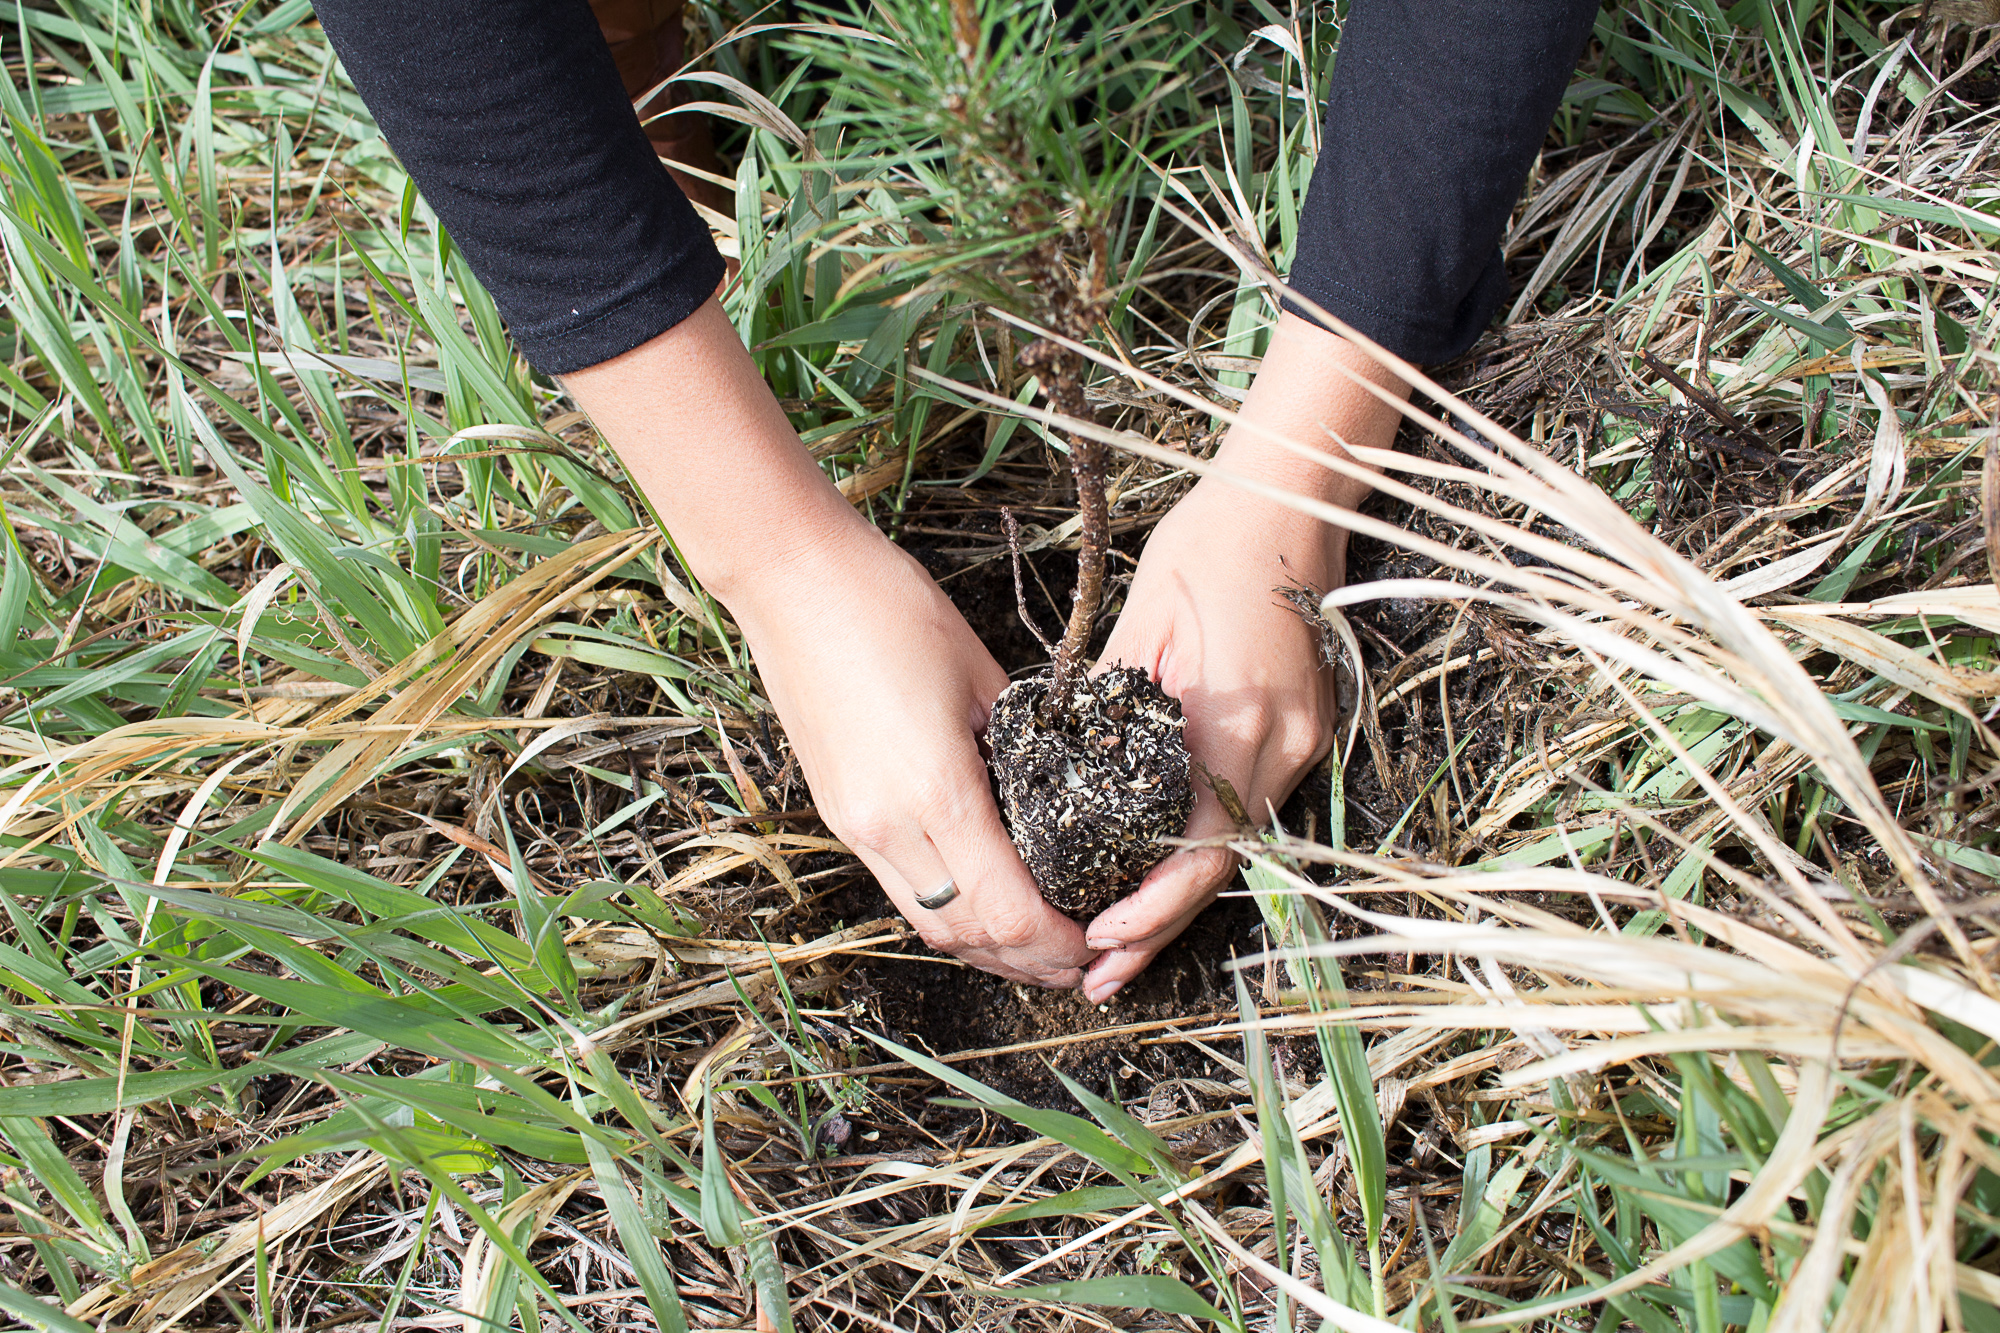 hands planting a sapling